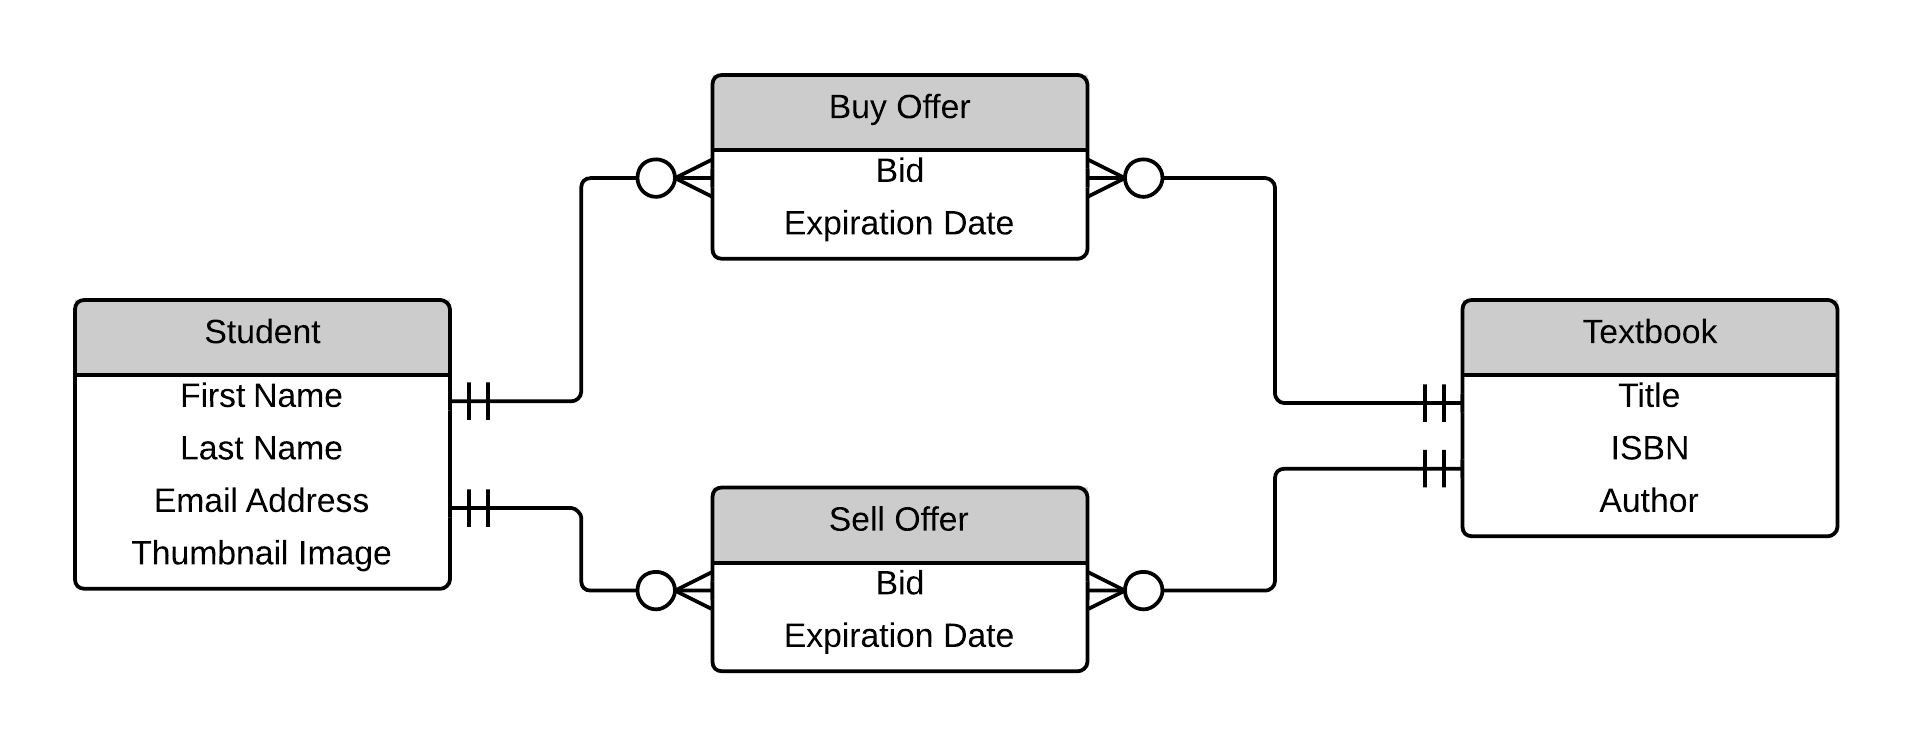 Textbook Mania Er Diagram Wod | Evan Komiyama intended for Er Diagram Many To Many